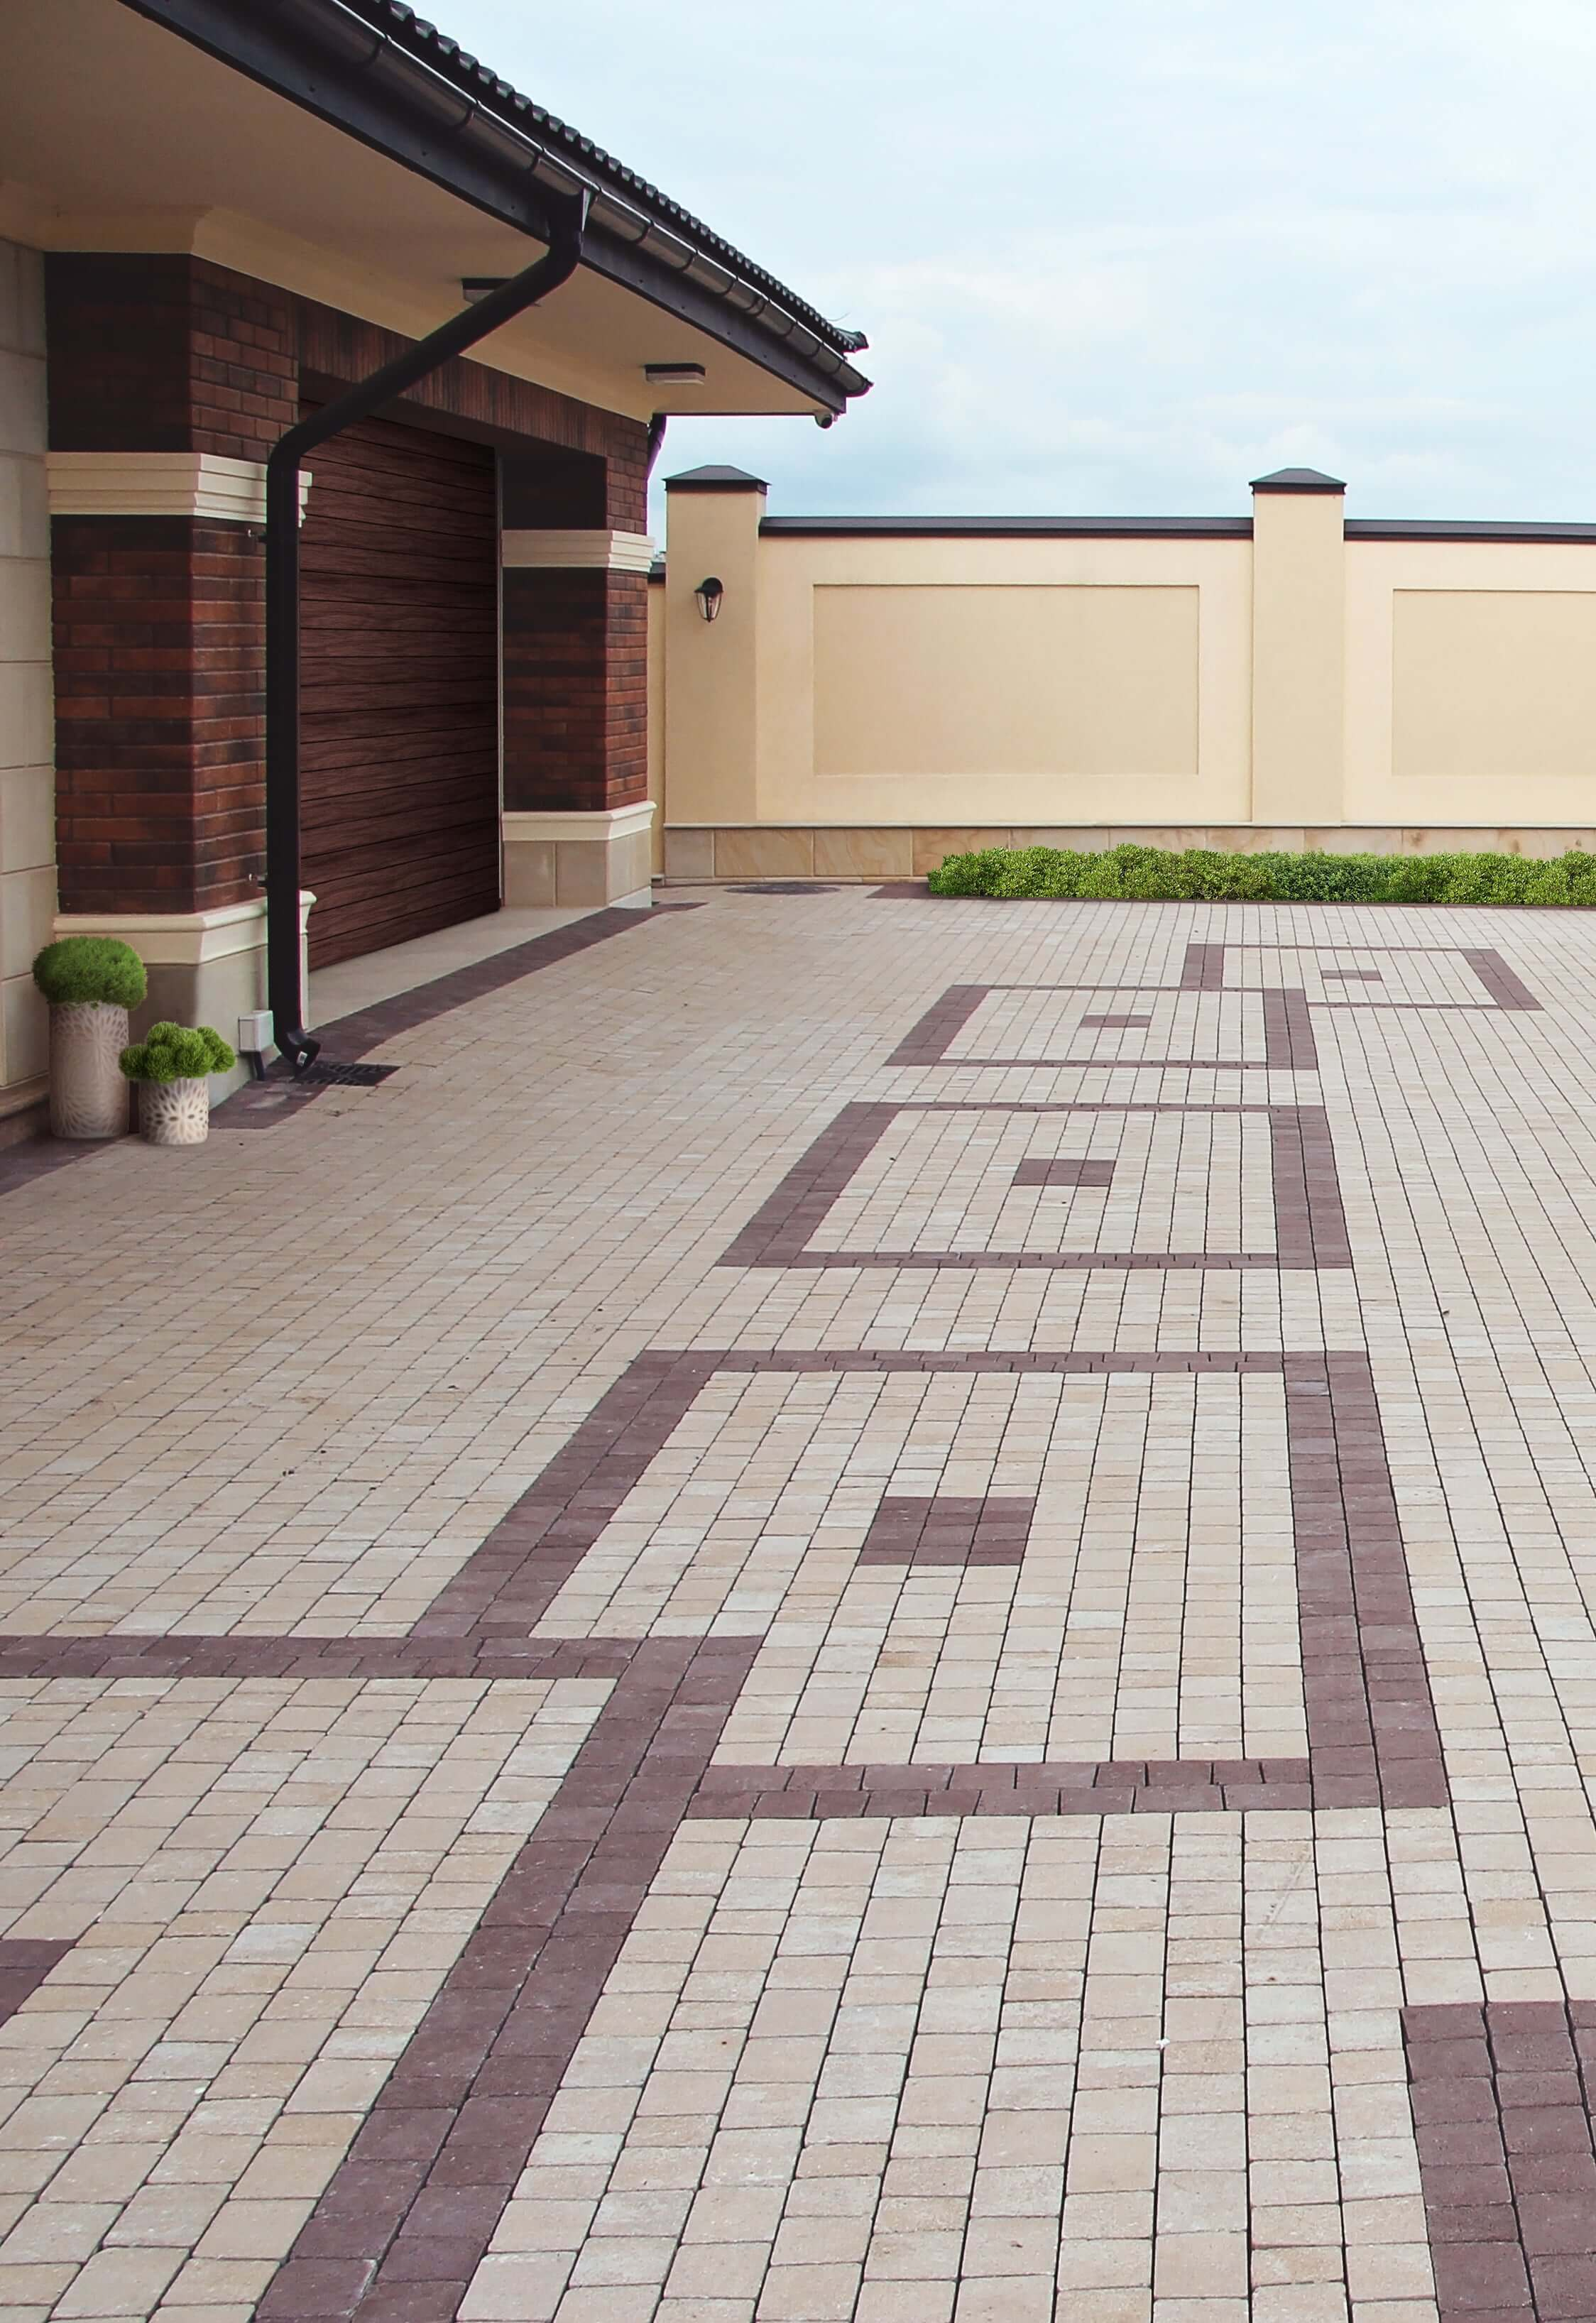 Брущатка для участка от салона плитки тротуарной Мелиус Винница Фото